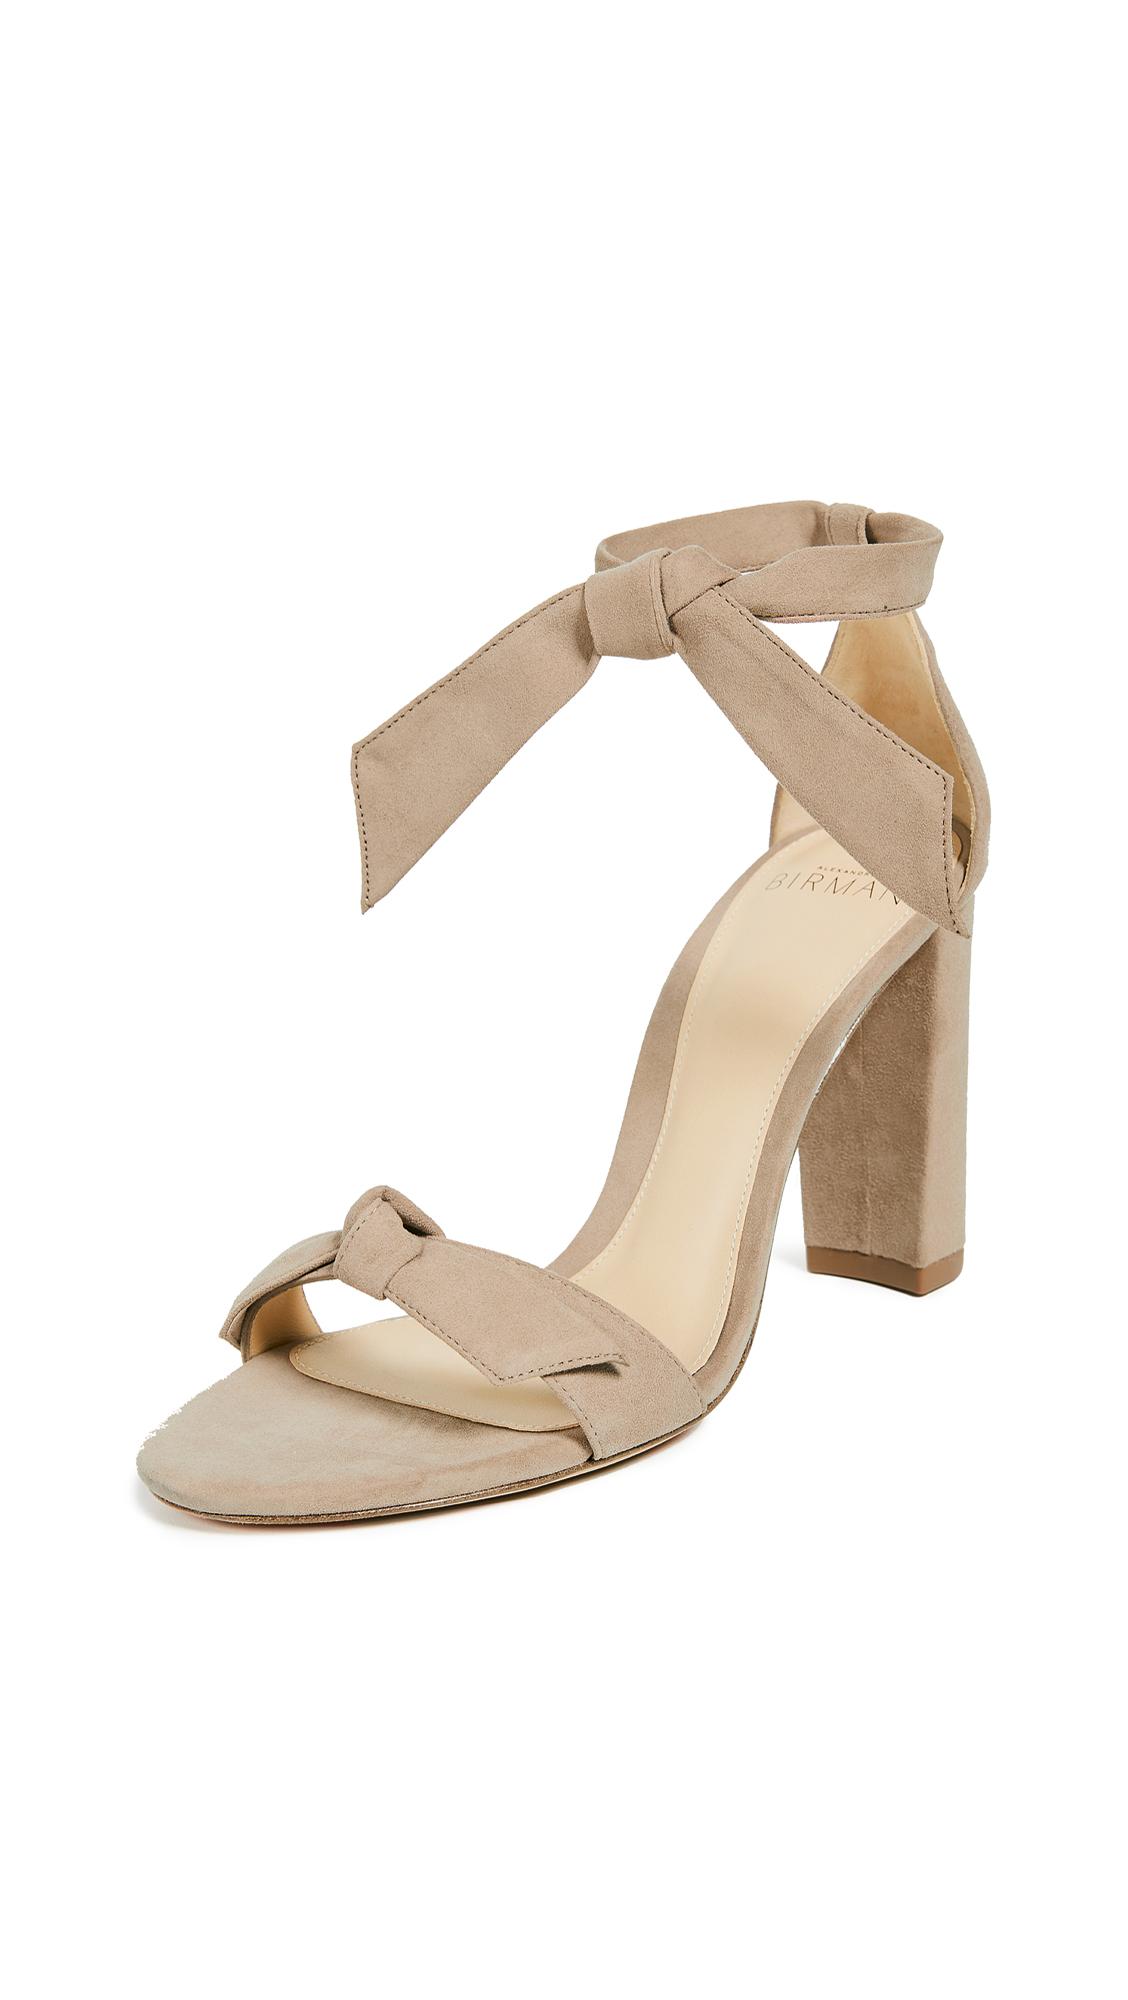 Buy Alexandre Birman Clarita Block Sandals online, shop Alexandre Birman